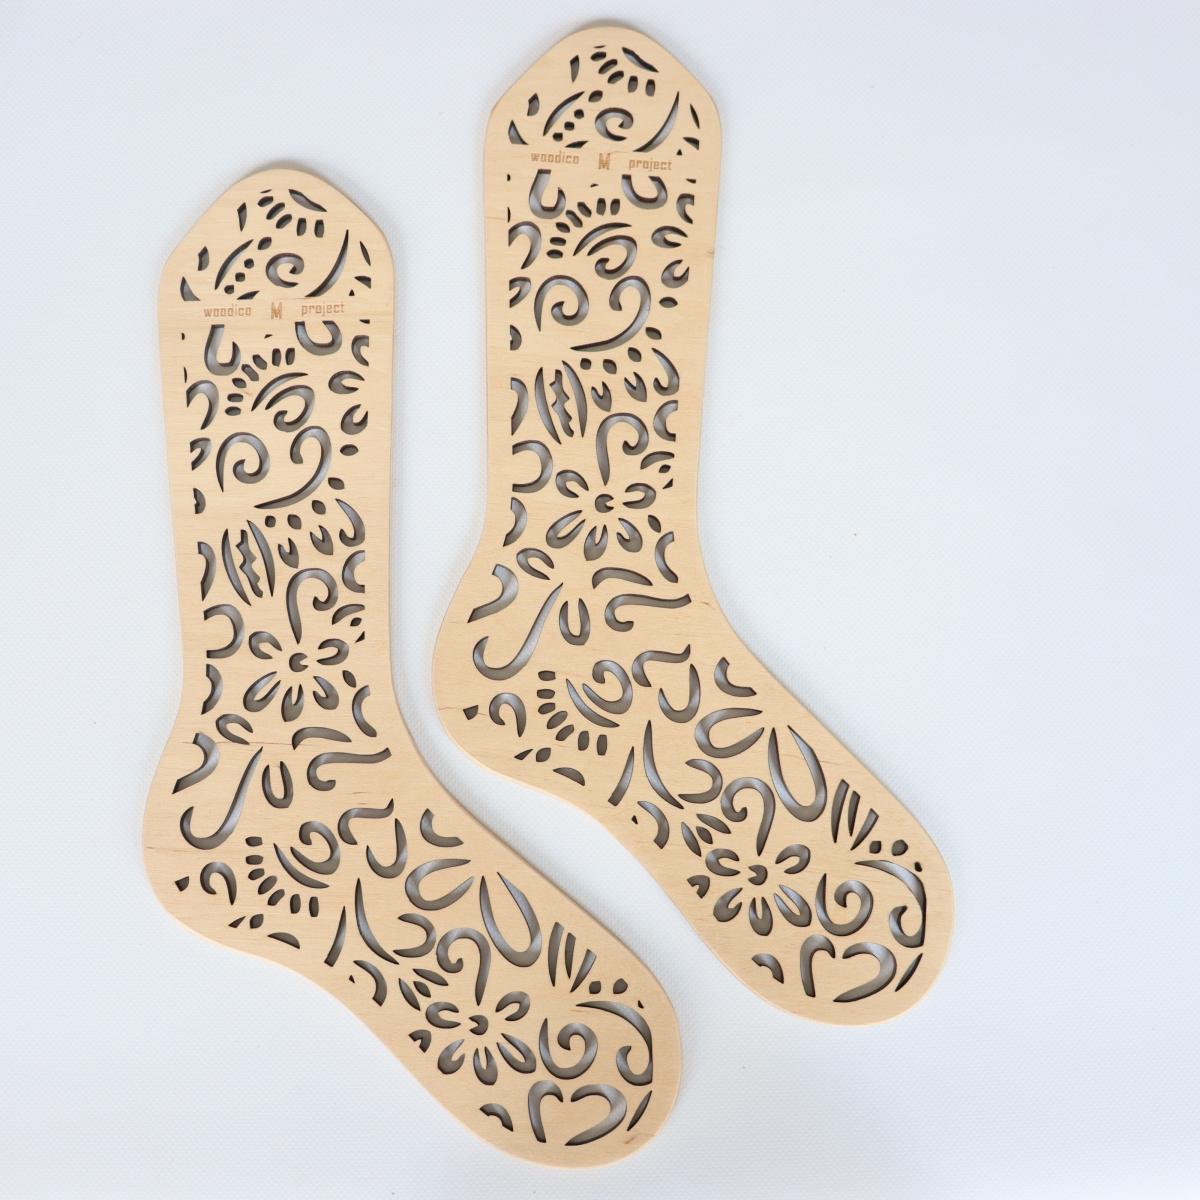 woodico.pro wooden sock blockers seeds 1 1200x1200 - Wooden sock blockers / Seeds